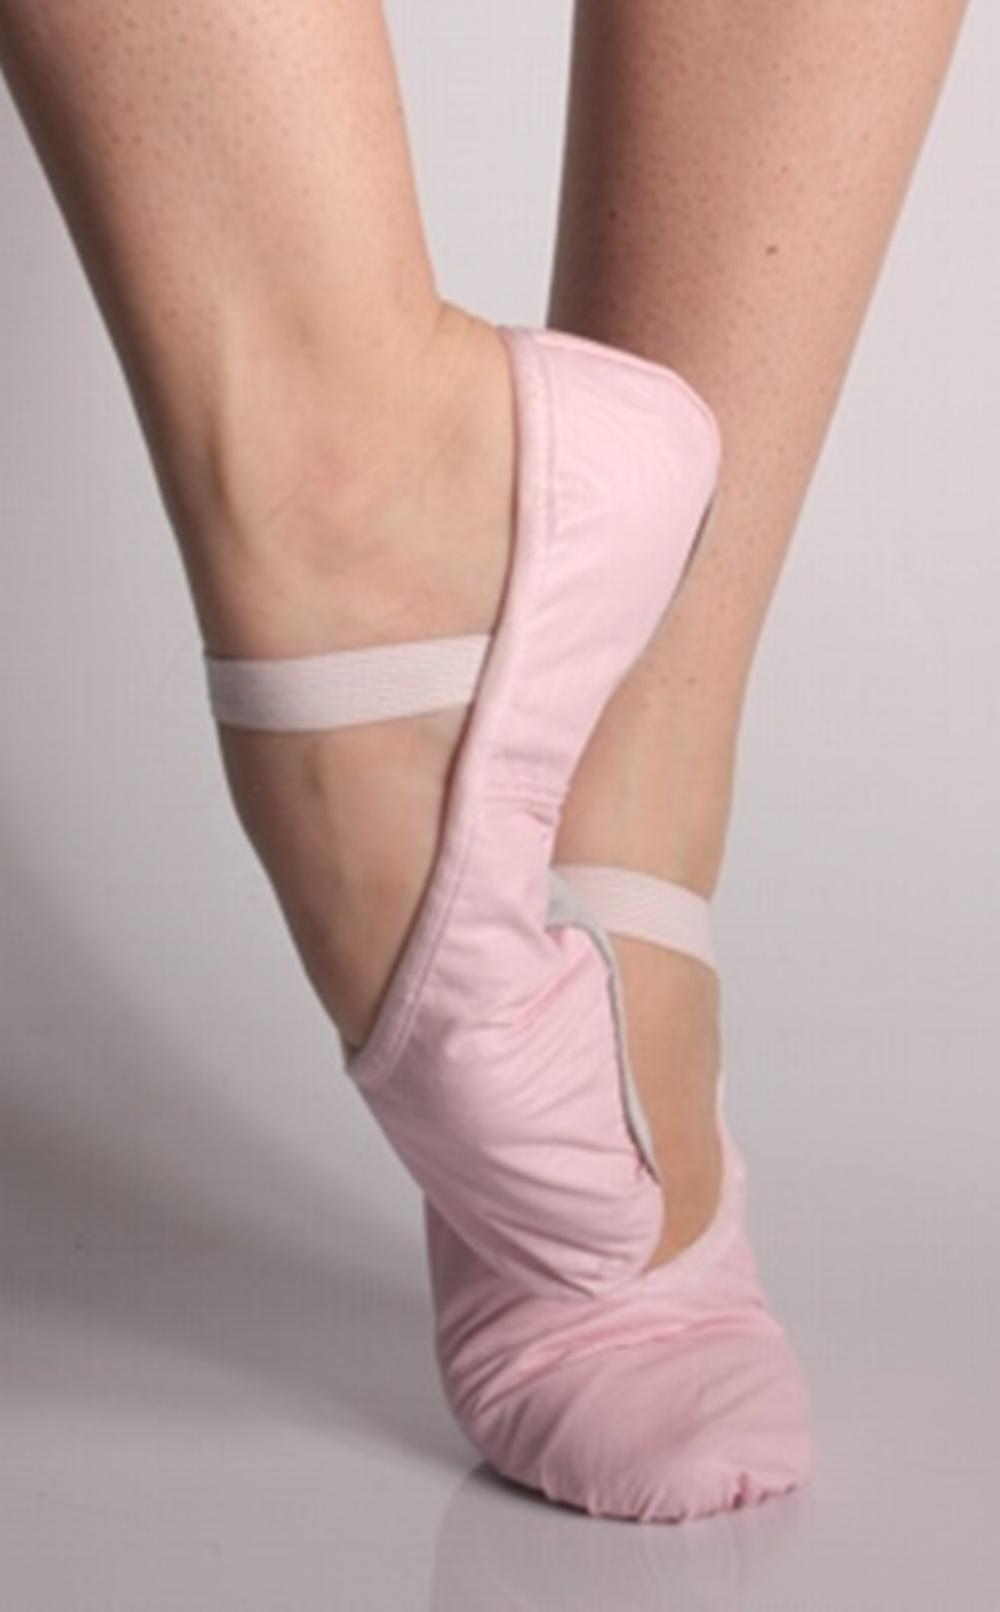 6704f90deb Sapatilha Fantasia Ballet sintética Rosa no Elo7